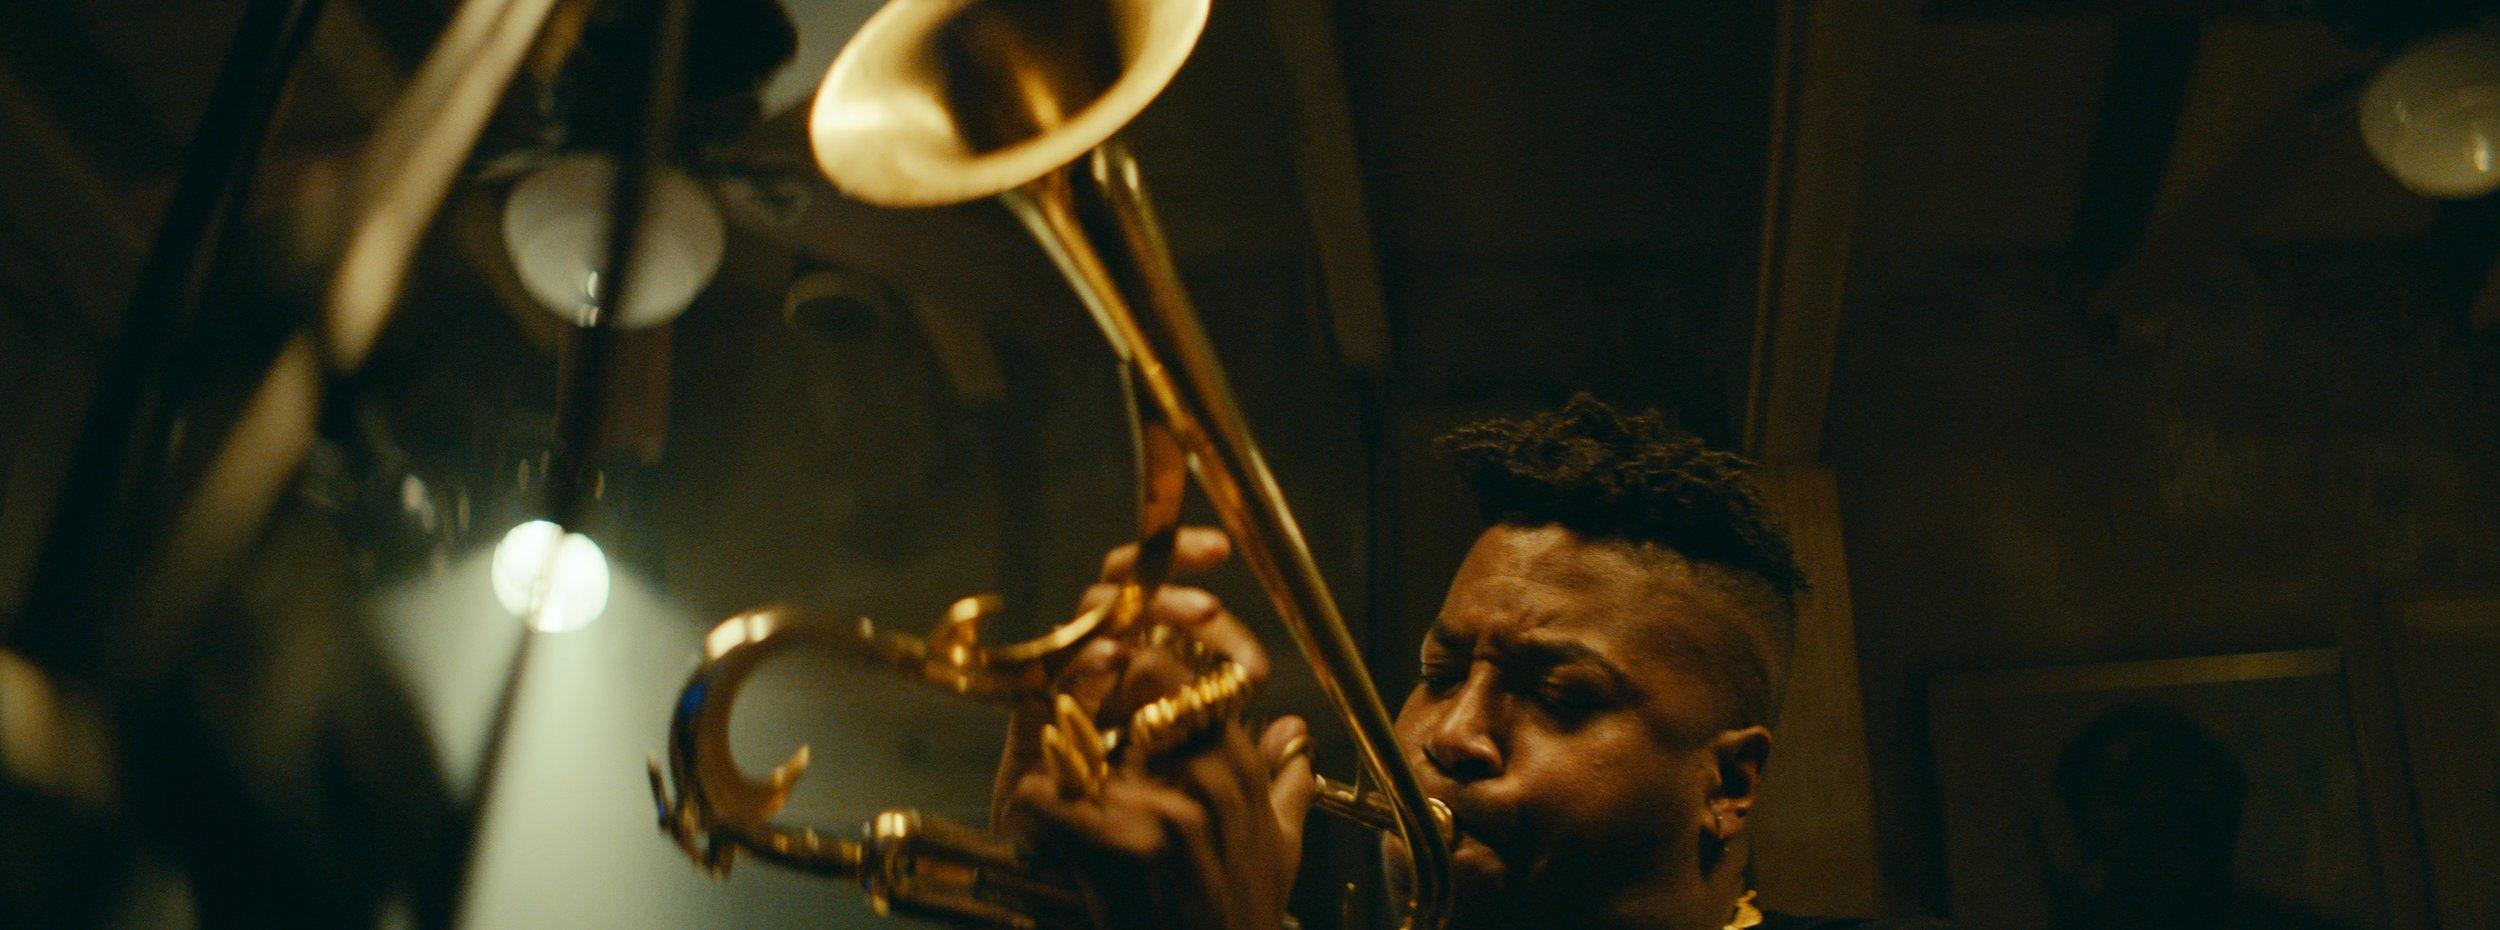 CS_performance_trumpet.jpg